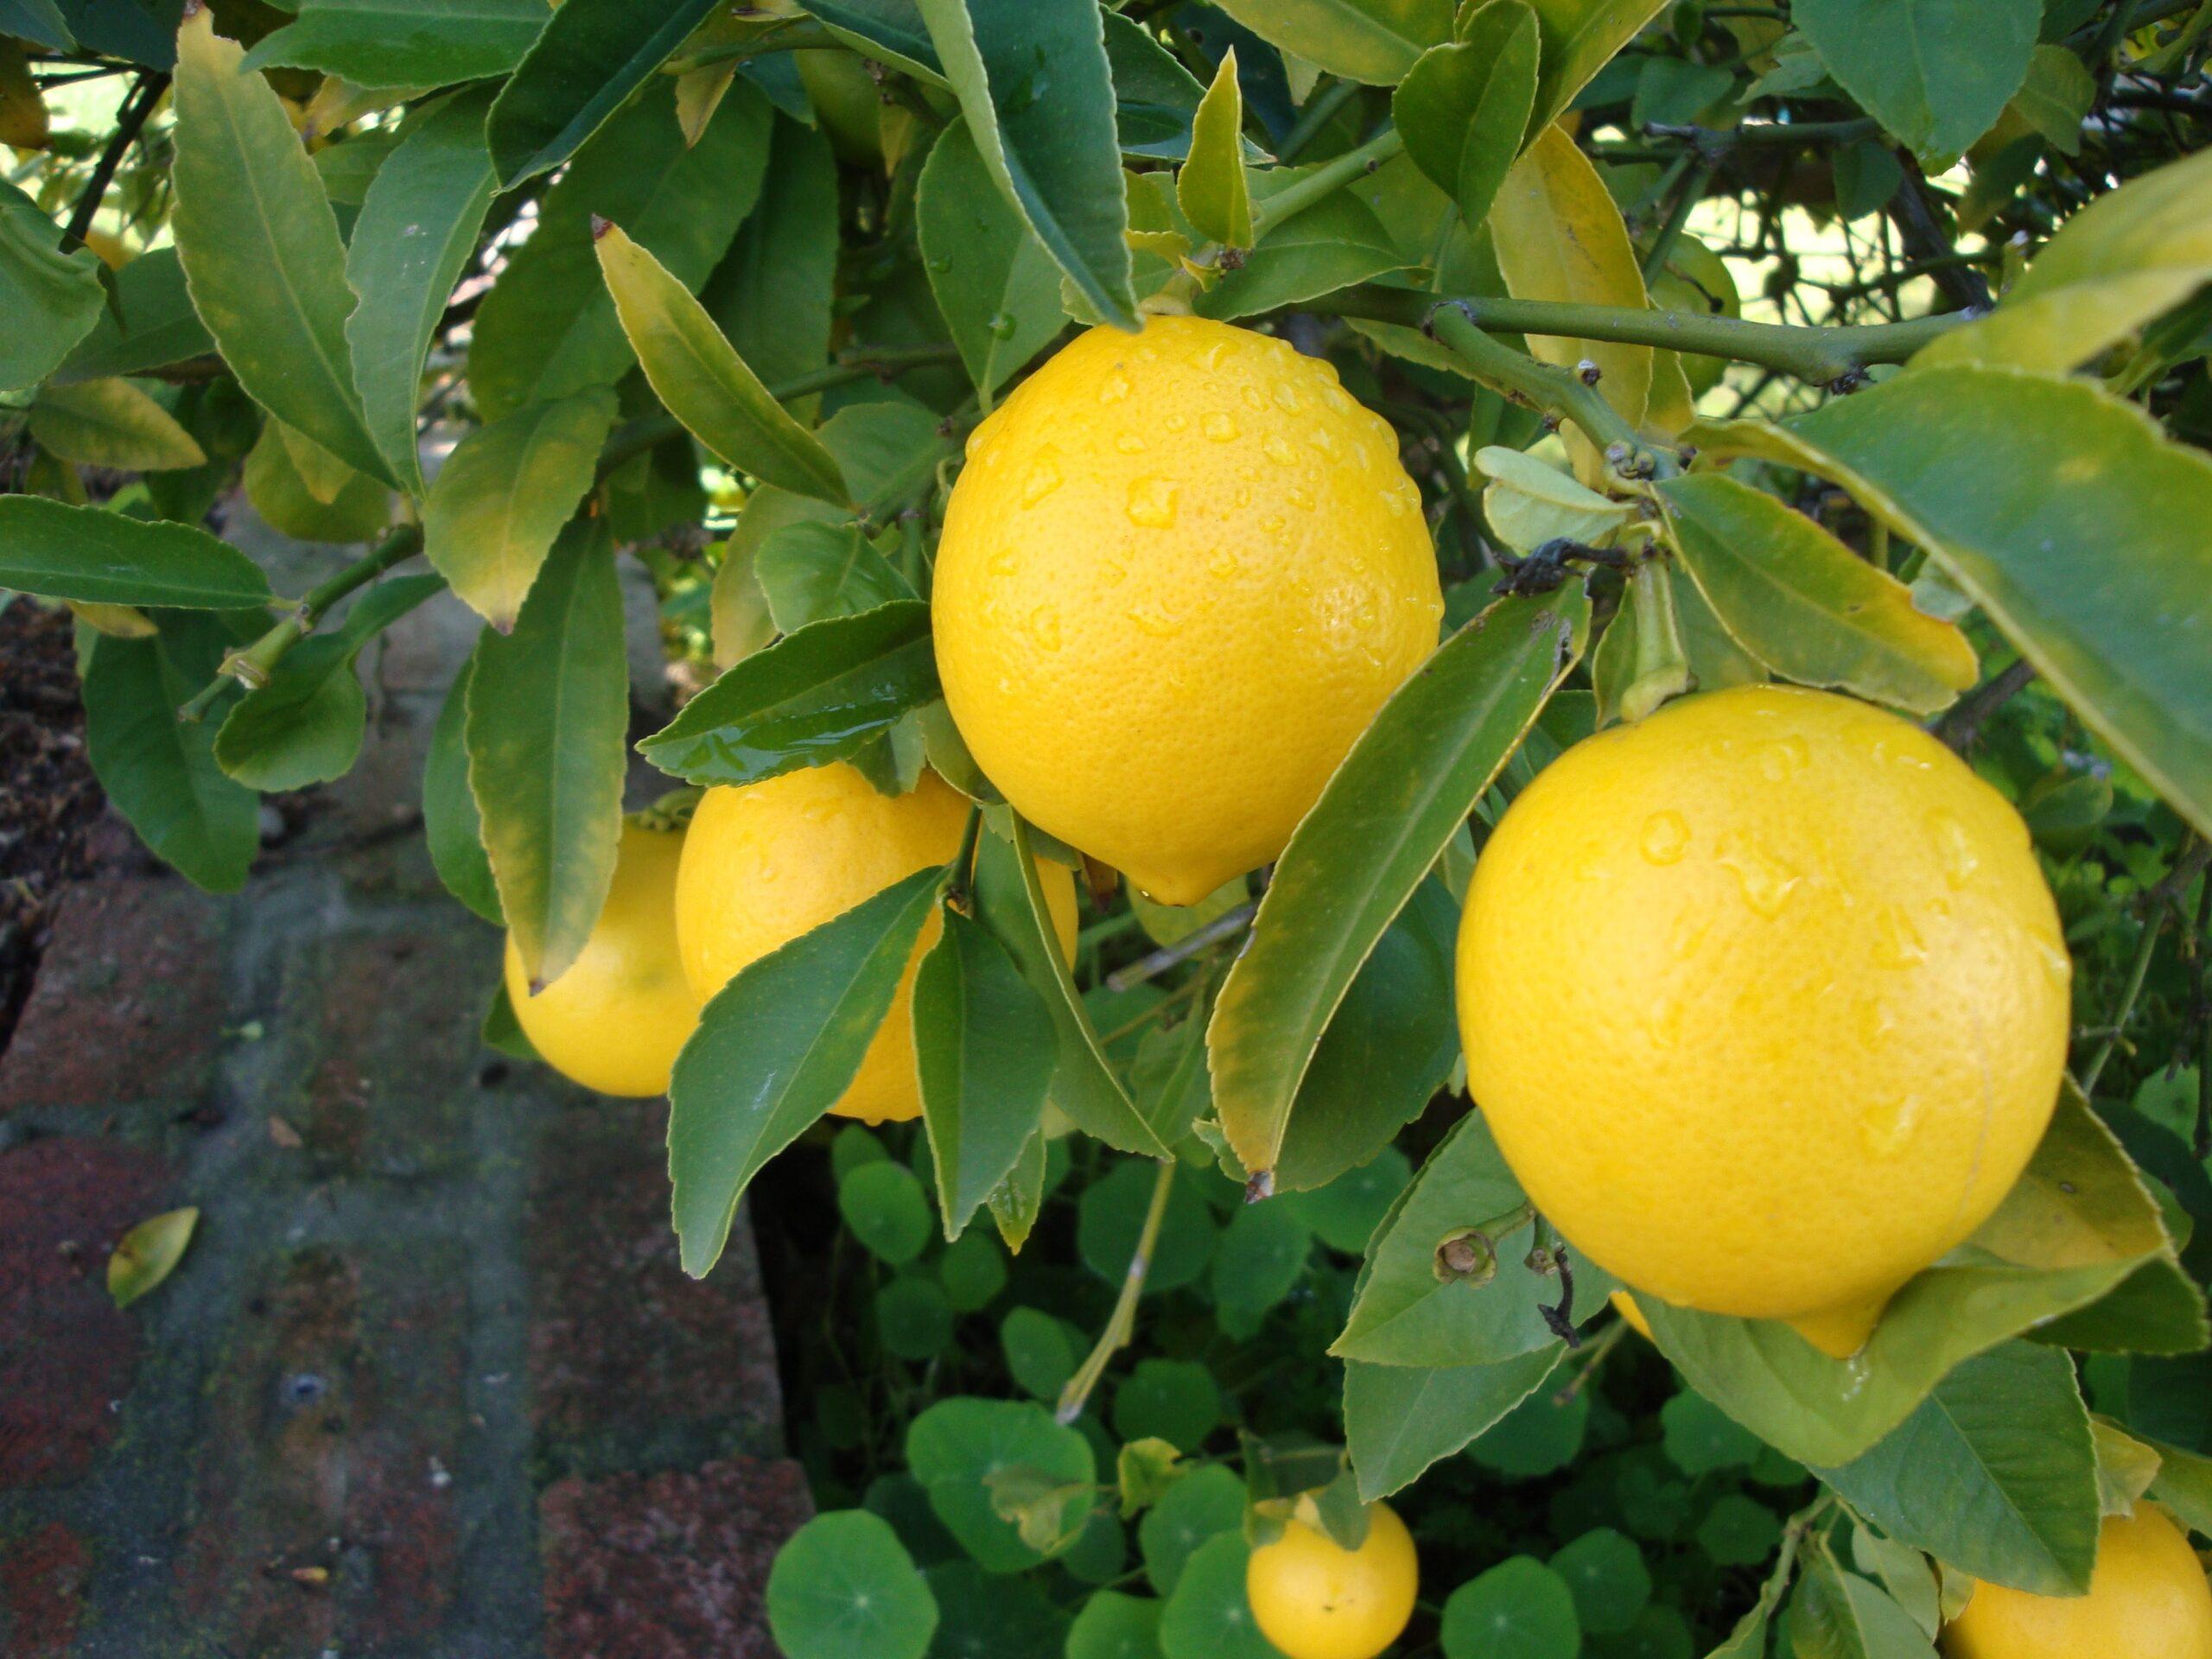 sidruni poletada rasva kiiresti Kaalulangus insultist